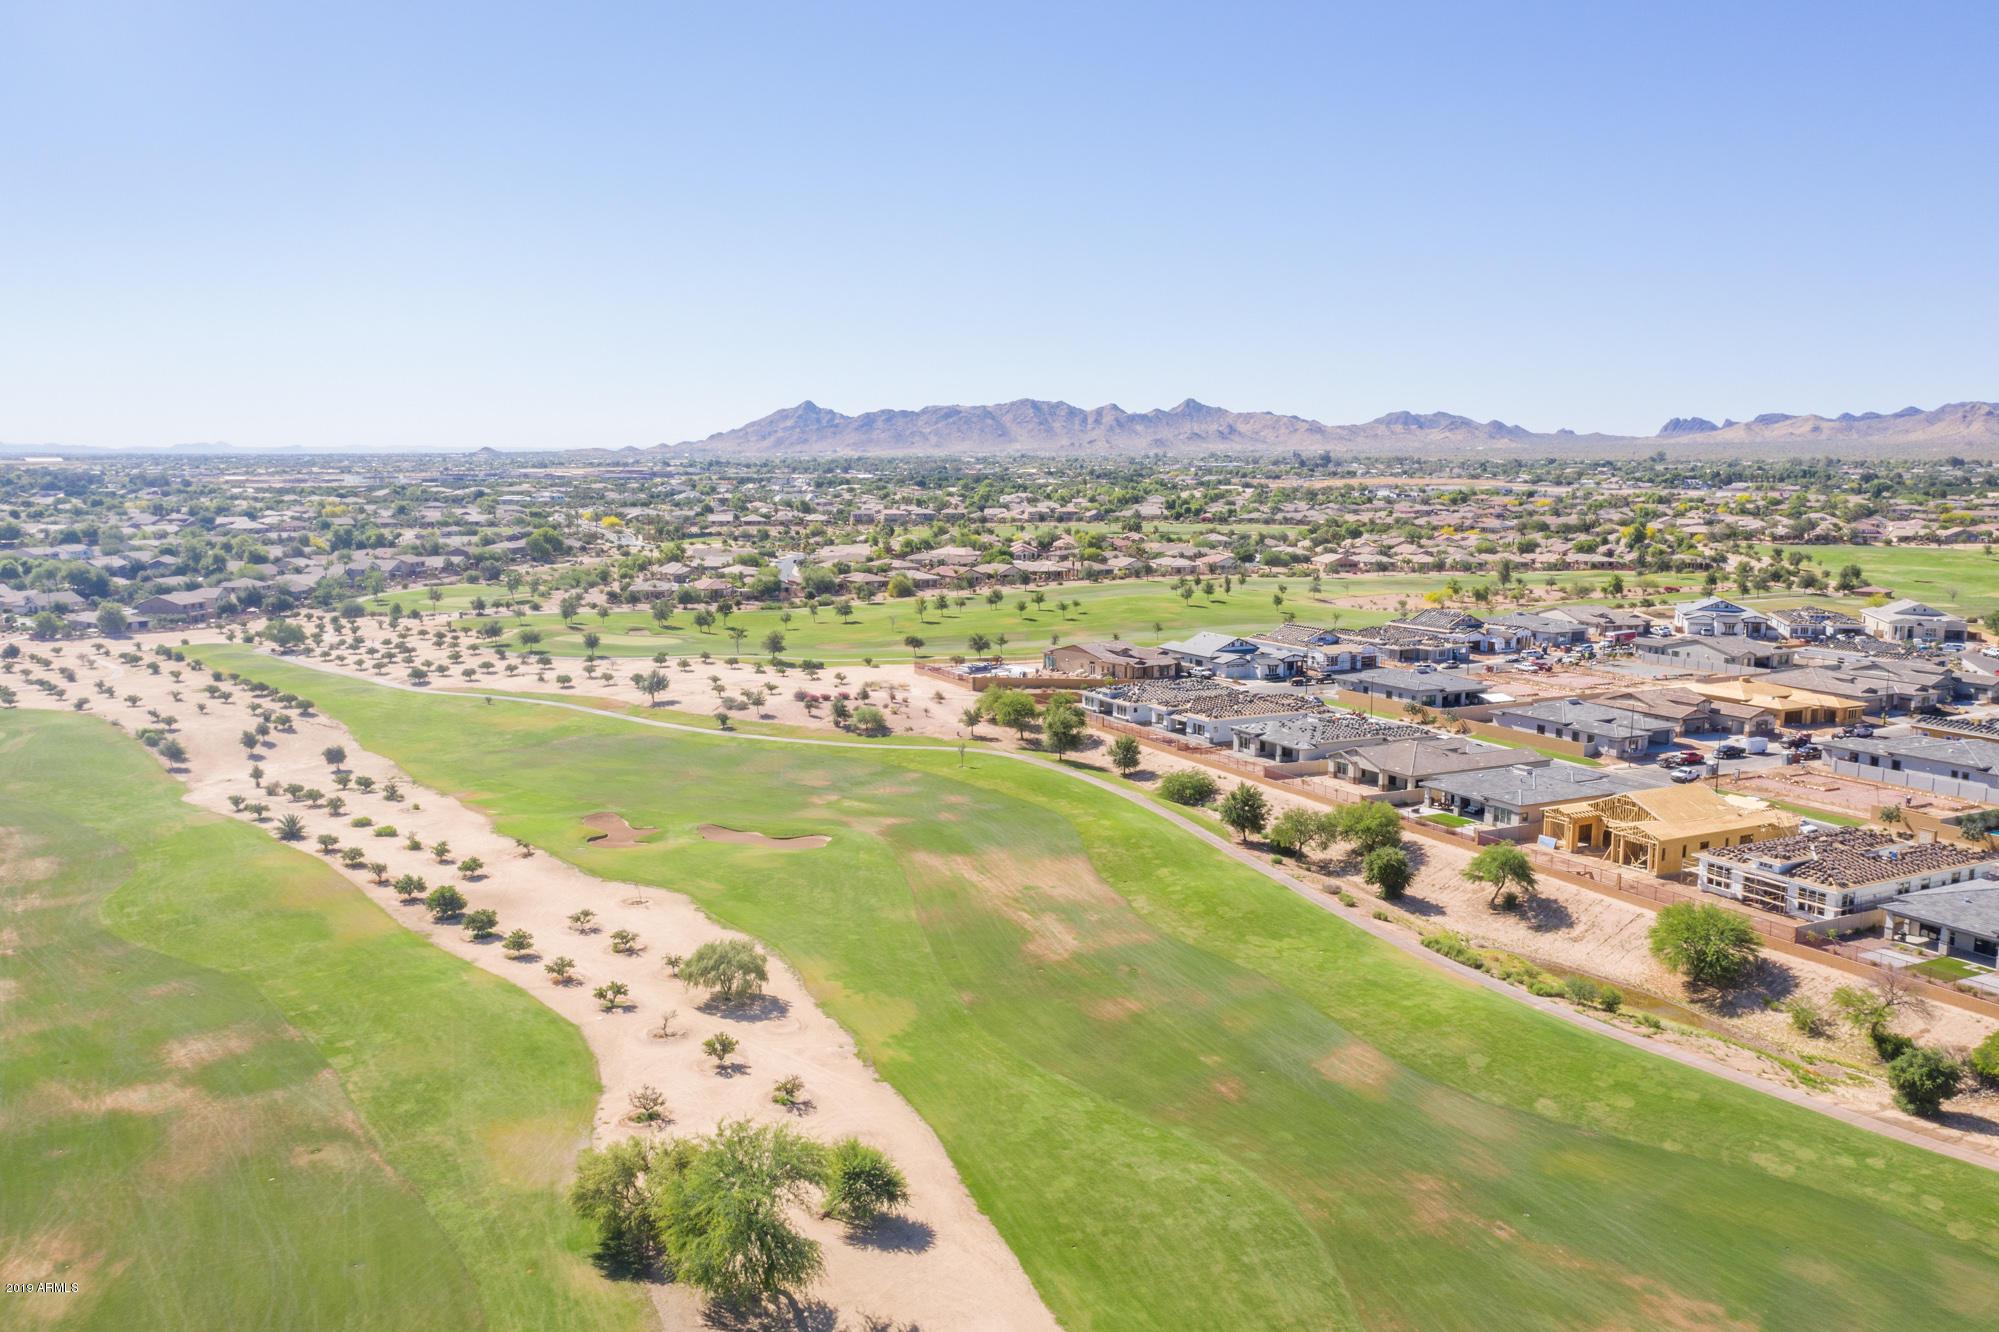 MLS 5942038 4019 E MEADOWVIEW Drive, Gilbert, AZ 85298 Golf Course Lots